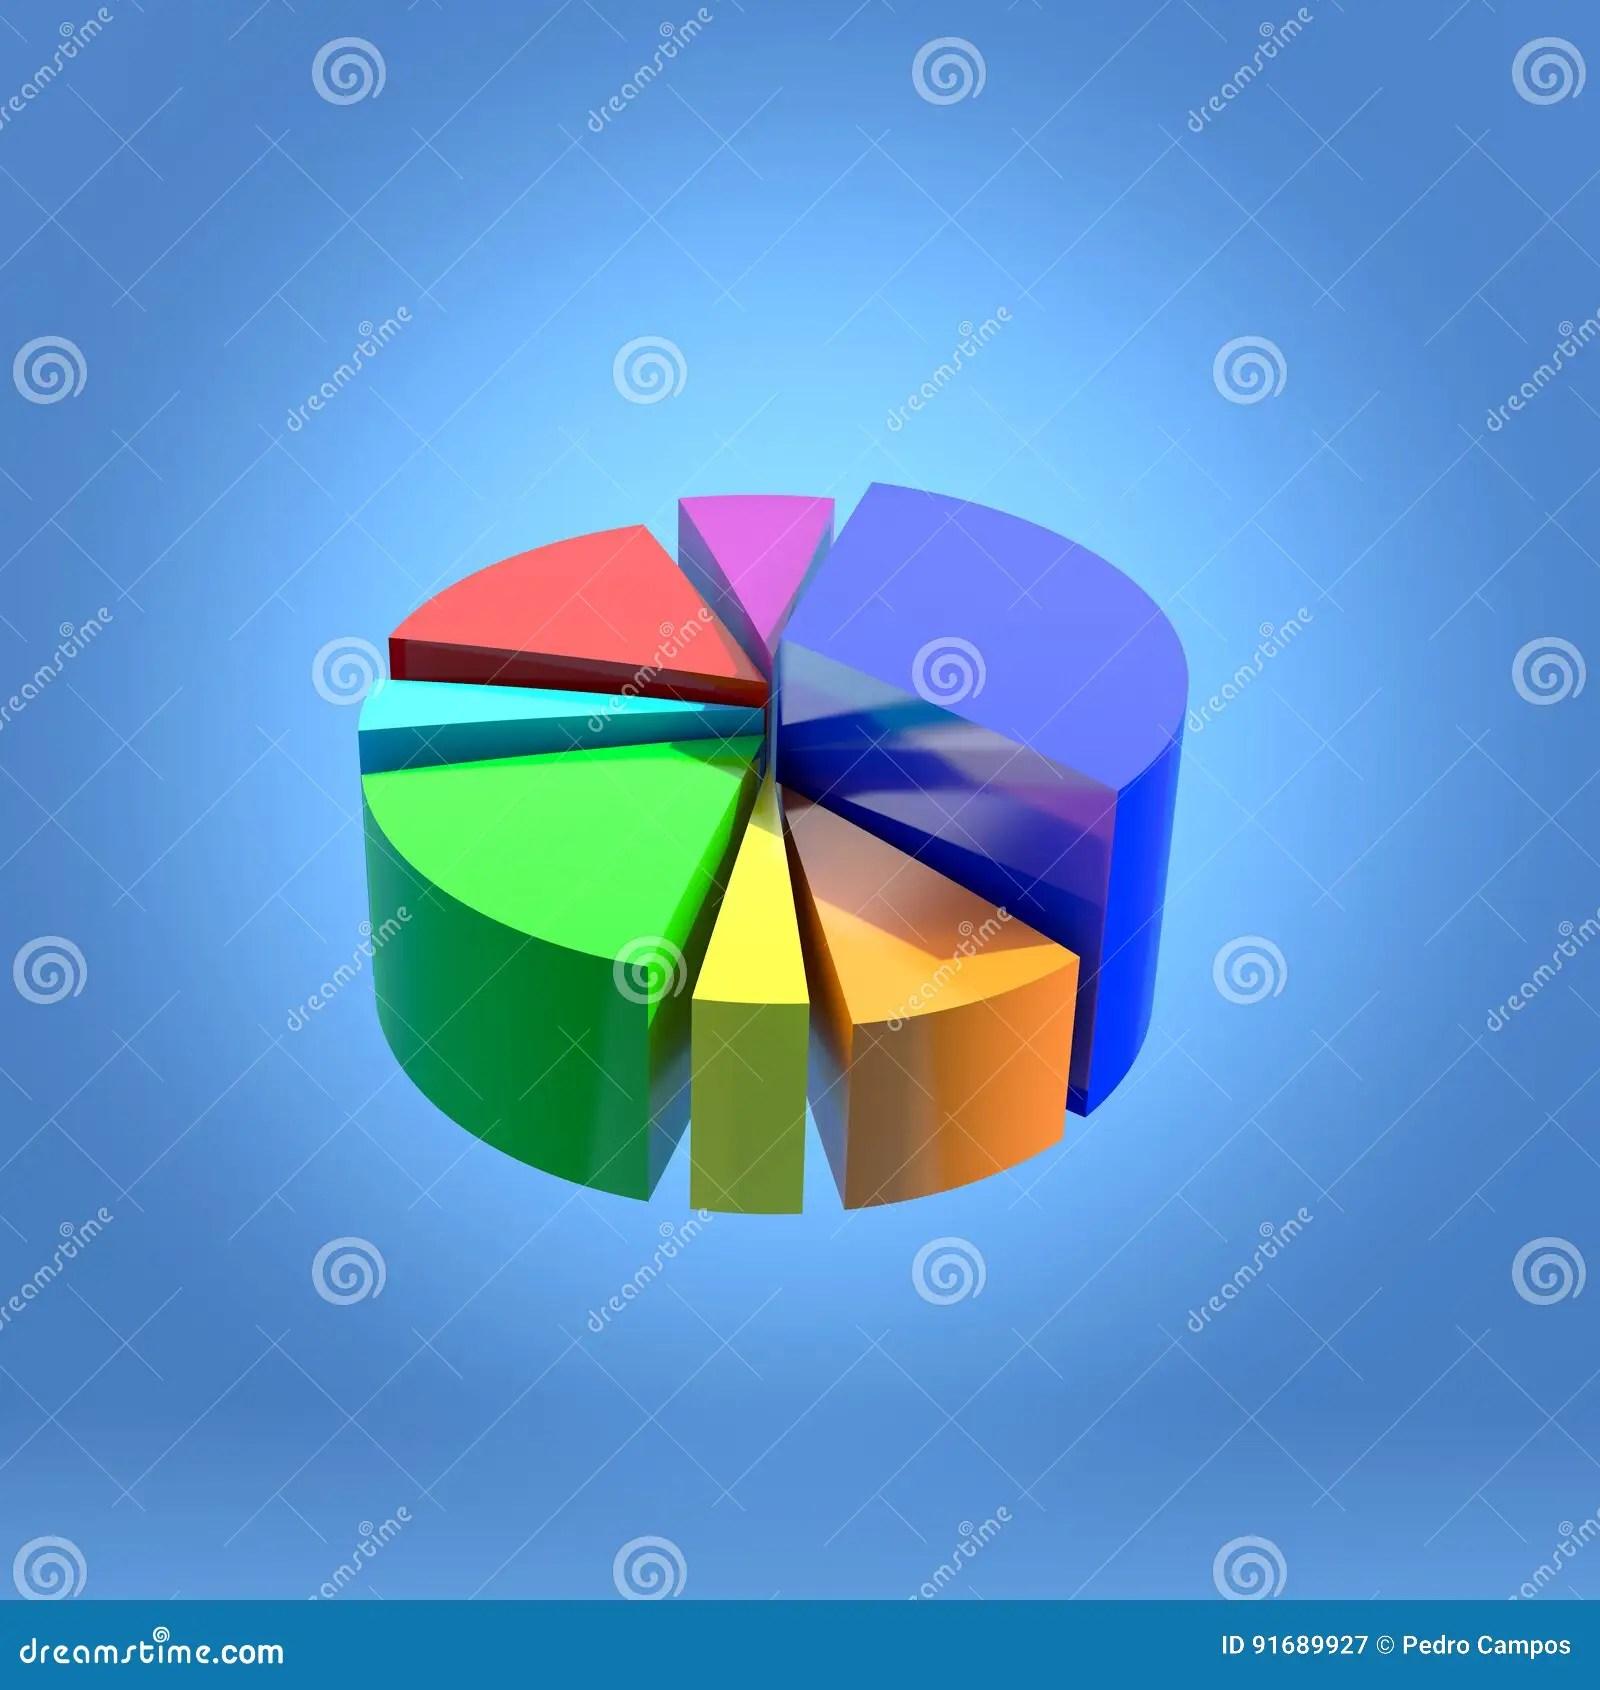 hight resolution of 3d circular statistics graphic